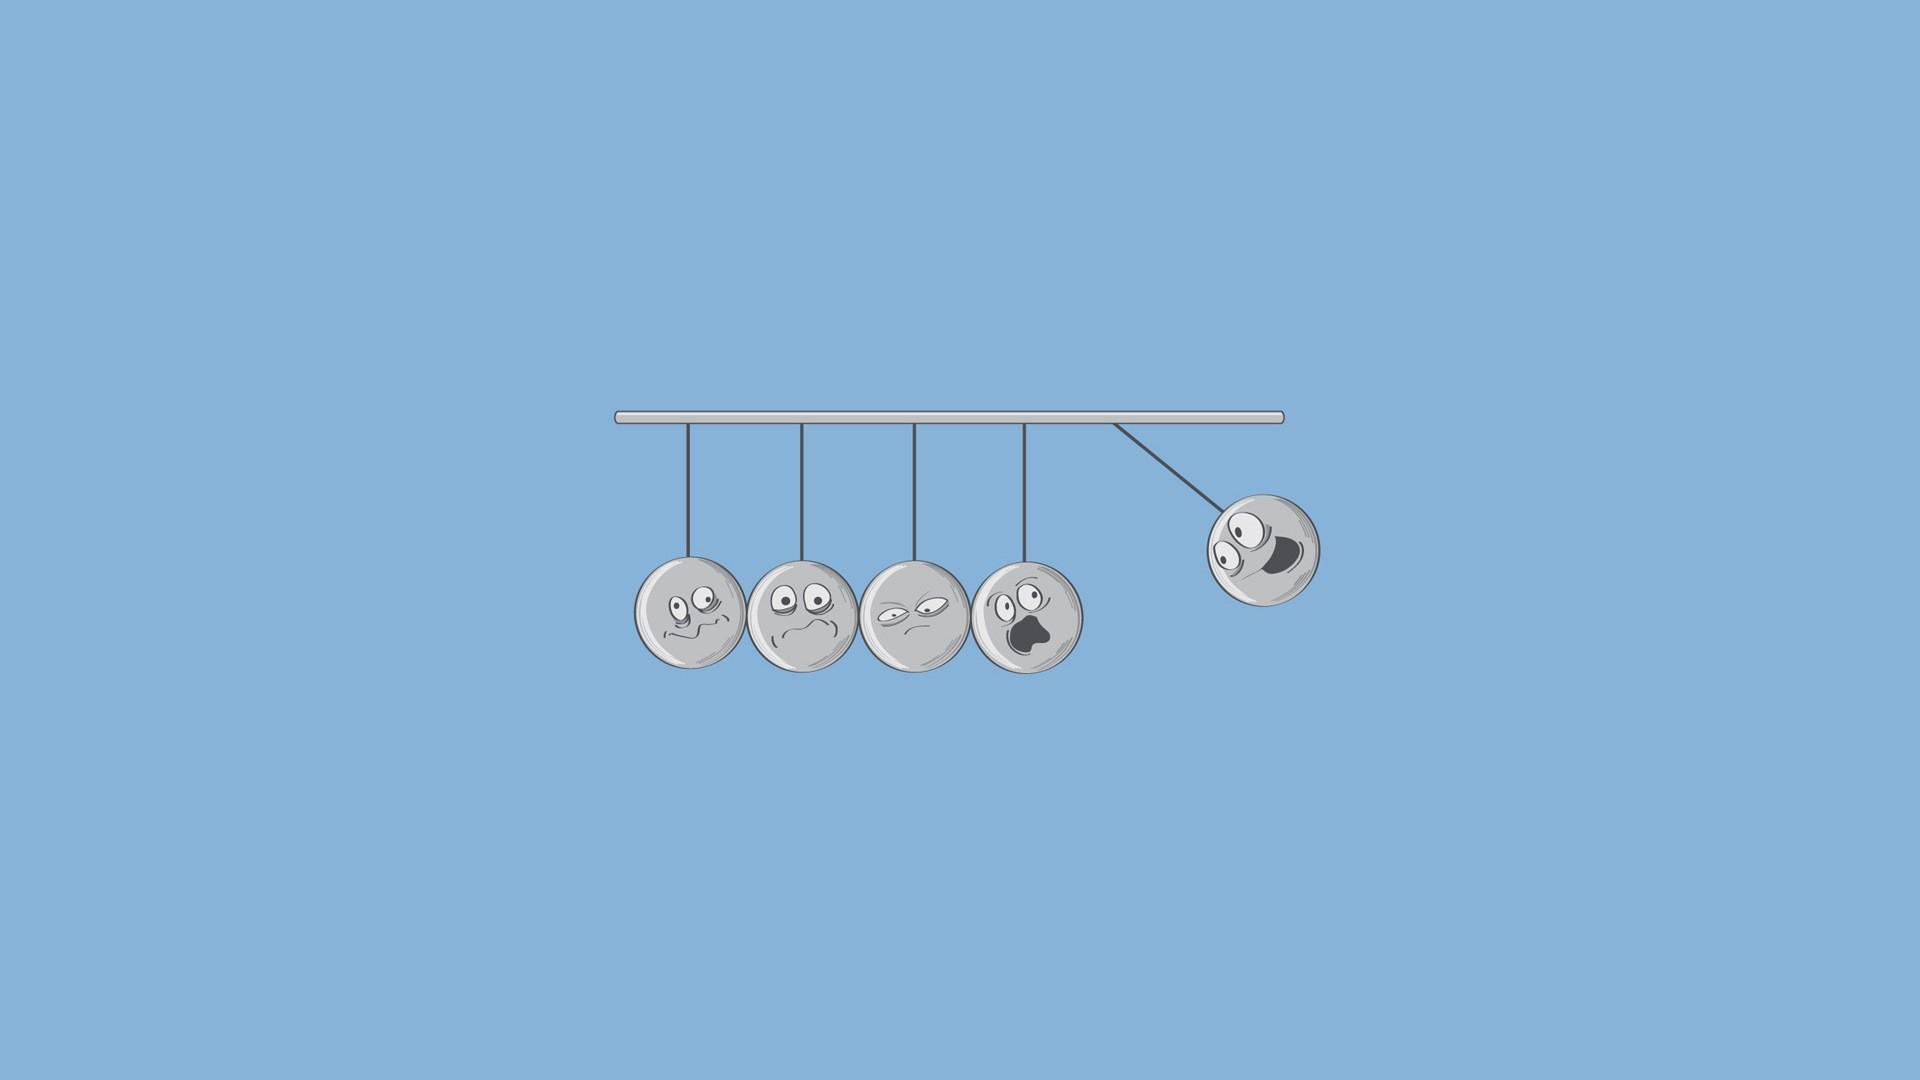 192 Minimalist Wallpaper Examples For A Simple Desktop